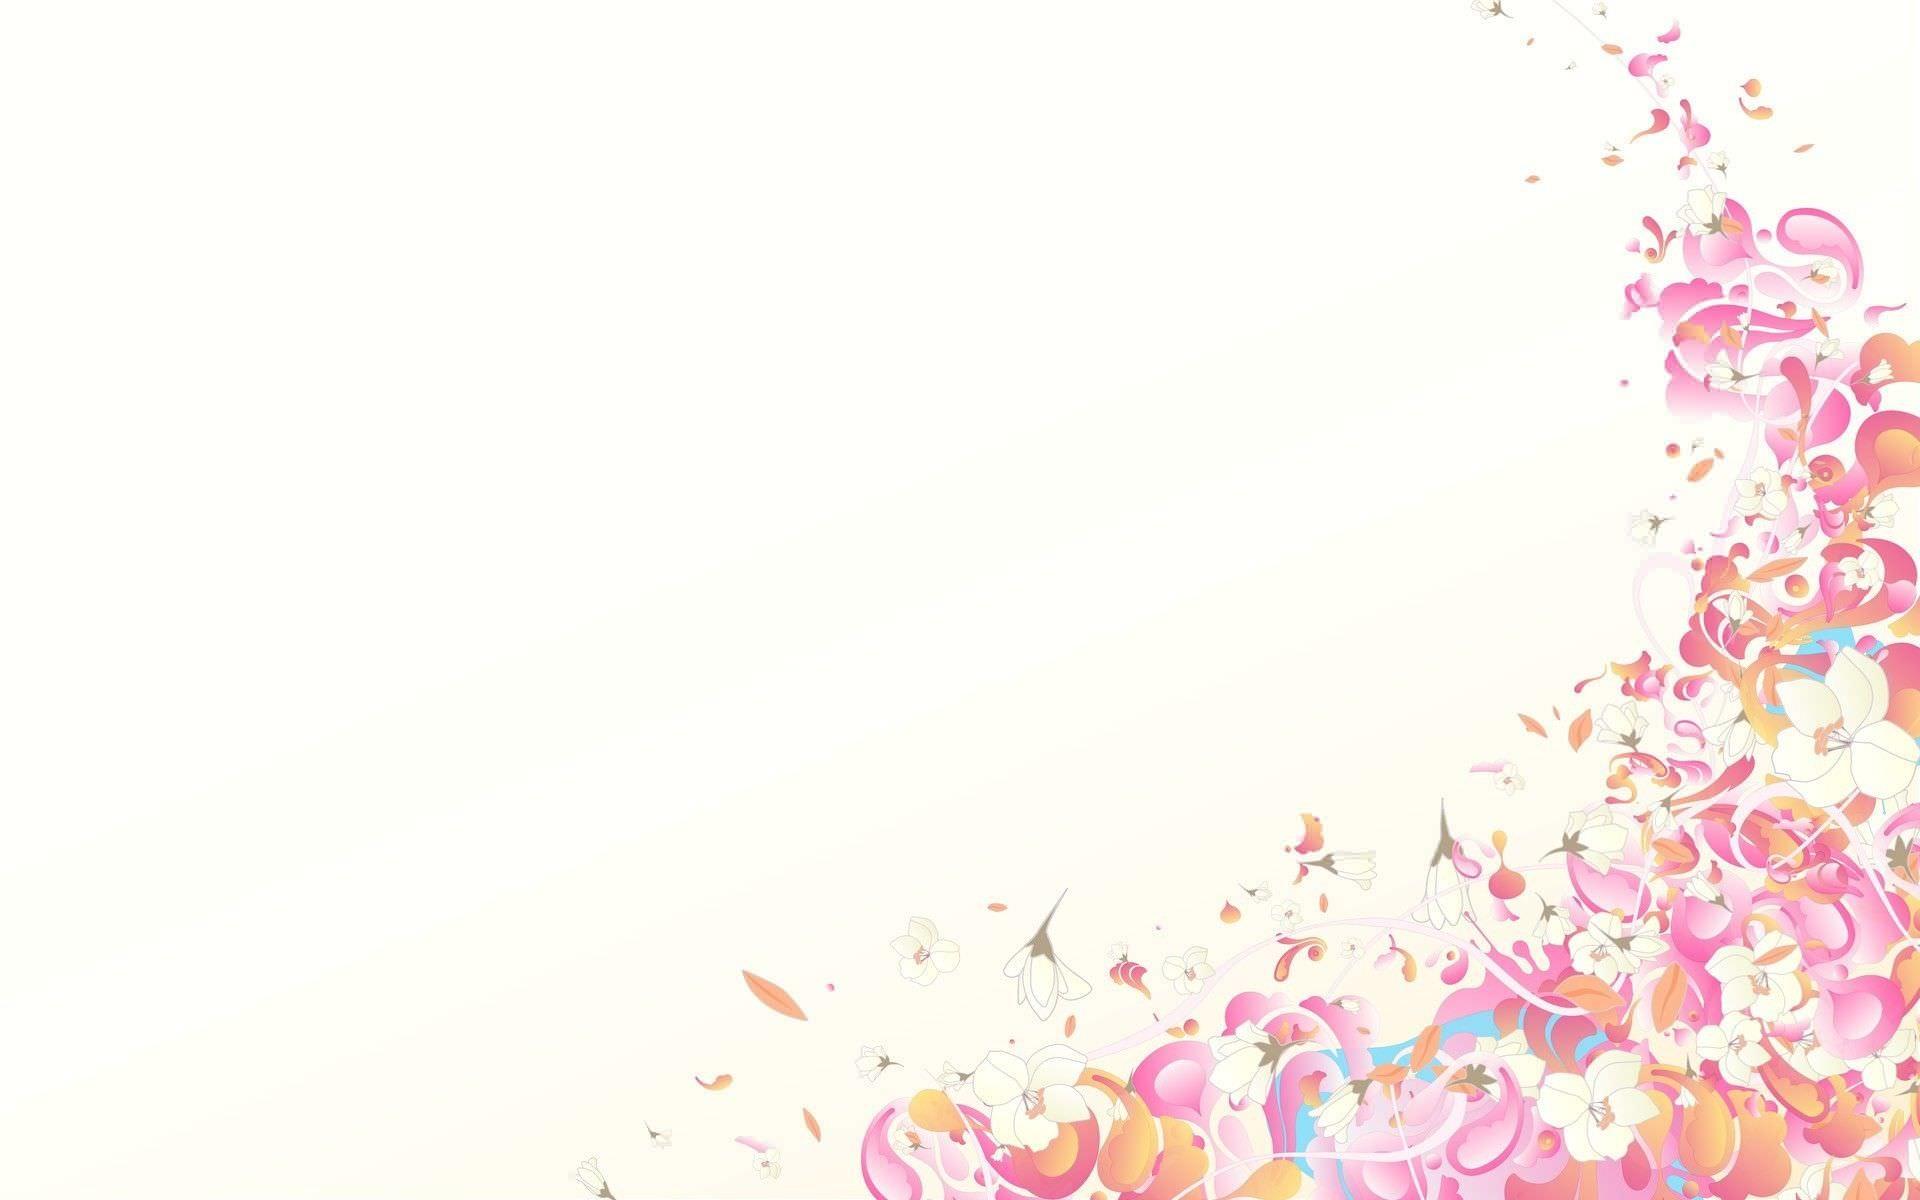 Pastel Wallpaper Images Flower Desktop Wallpaper Pastel 37652